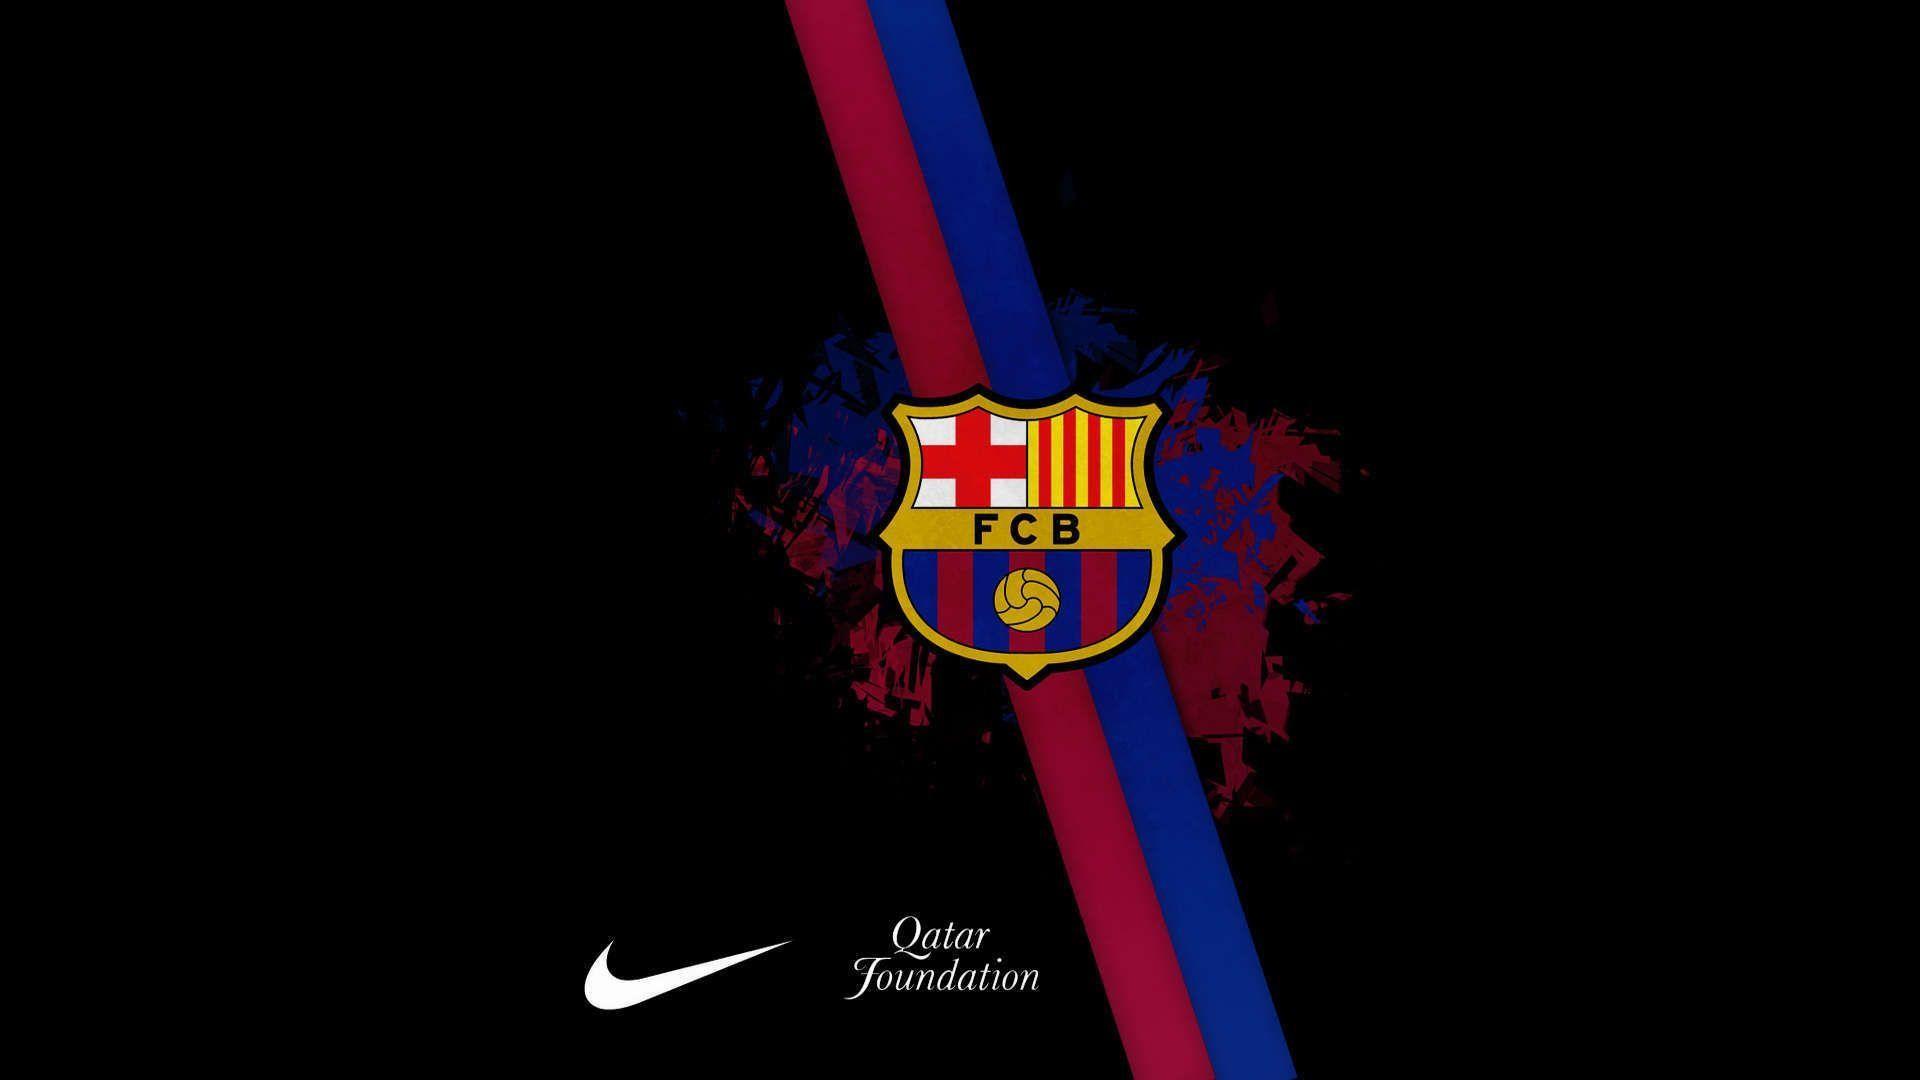 FC Barcelona Logo Wallpaper Download   HD Wallpapers, Backgrounds .